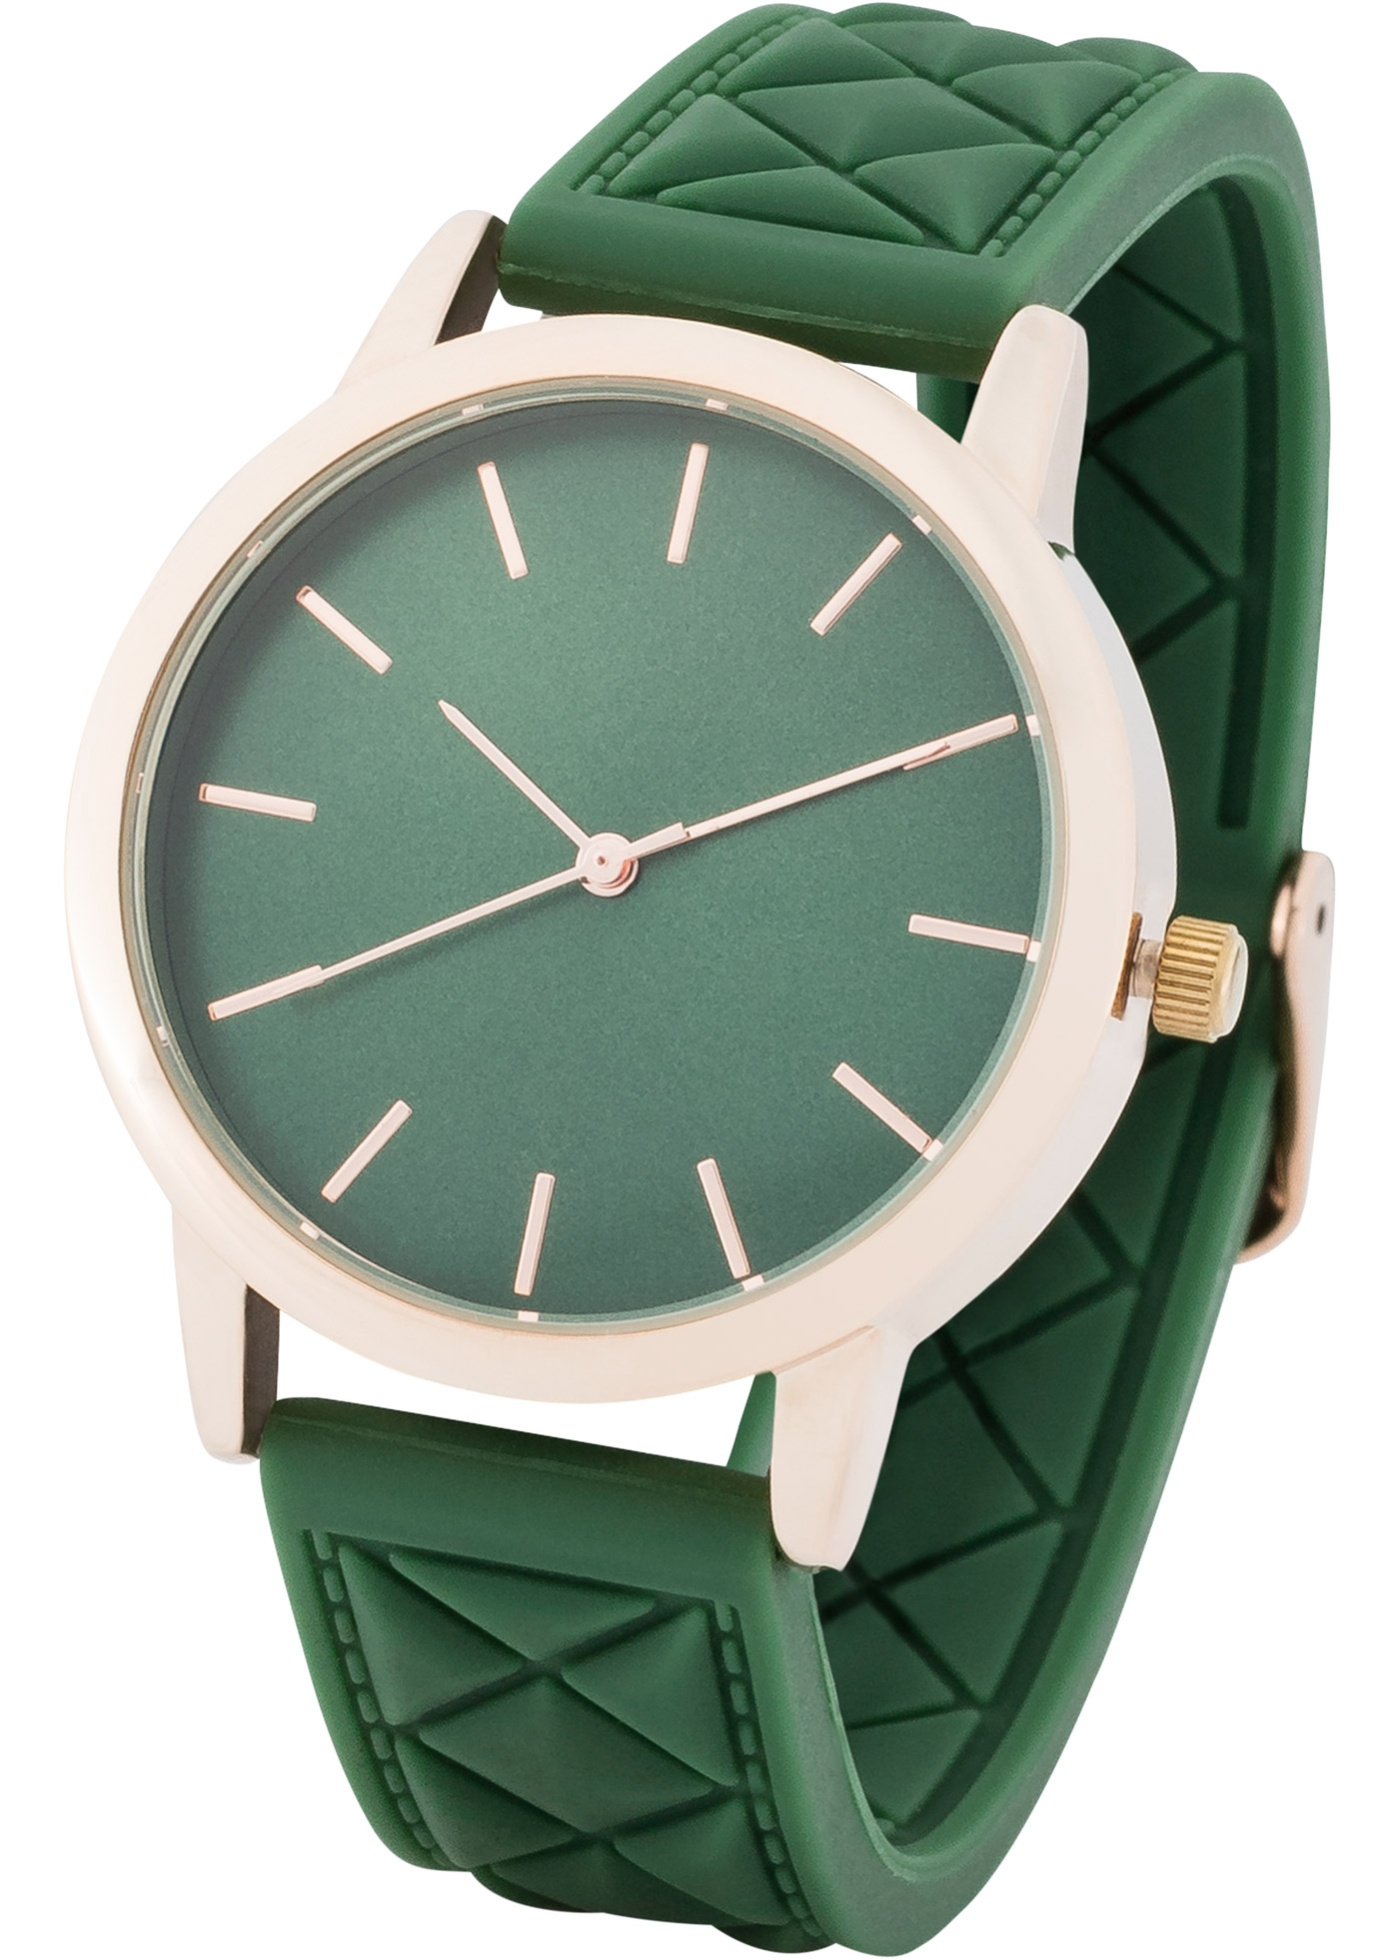 Orologio  Verde  - bpc bo